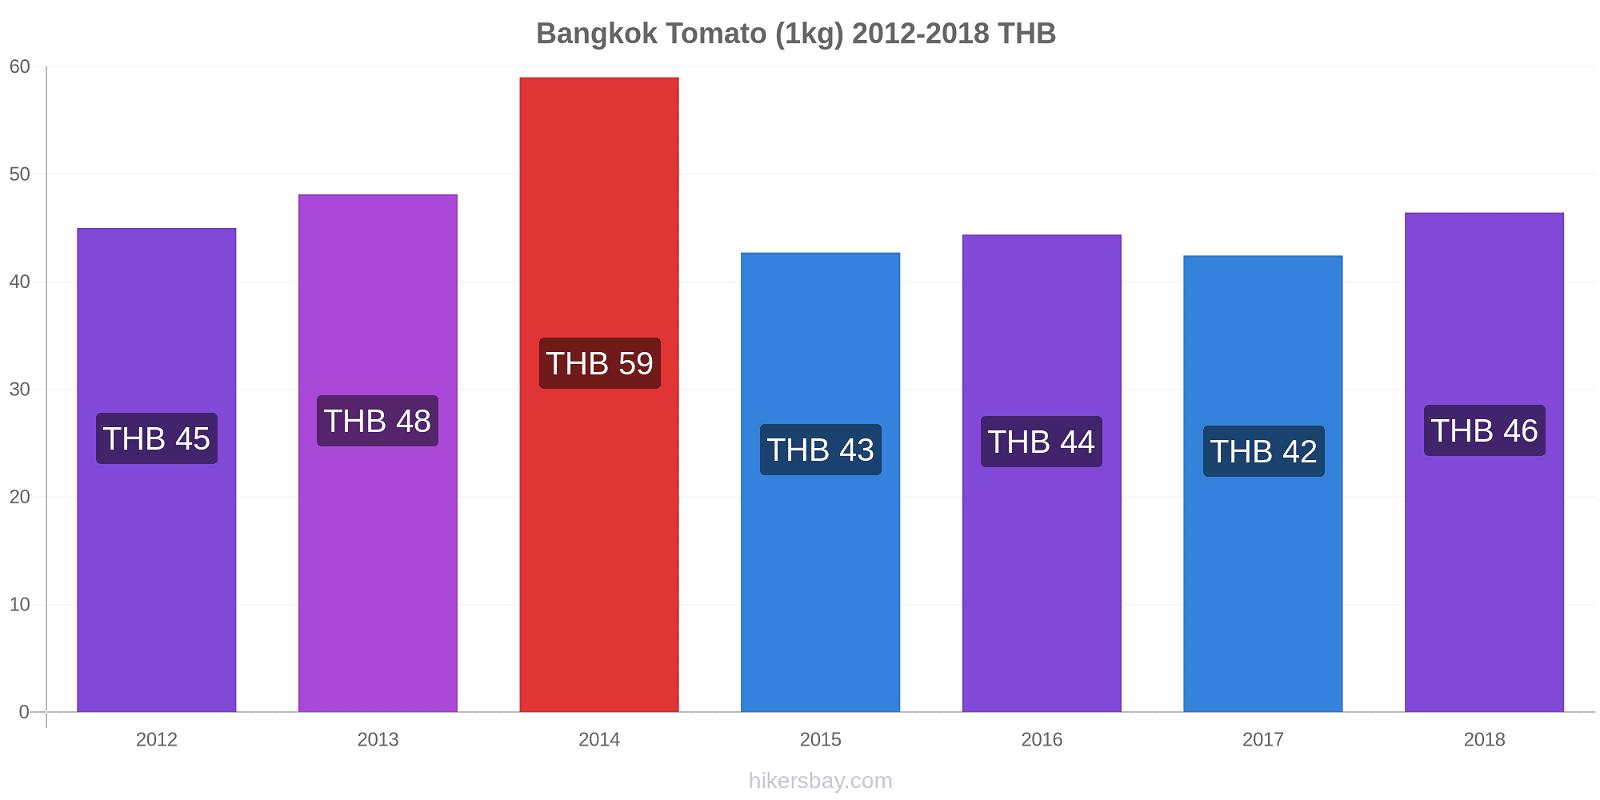 Bangkok price changes Tomato (1kg) hikersbay.com